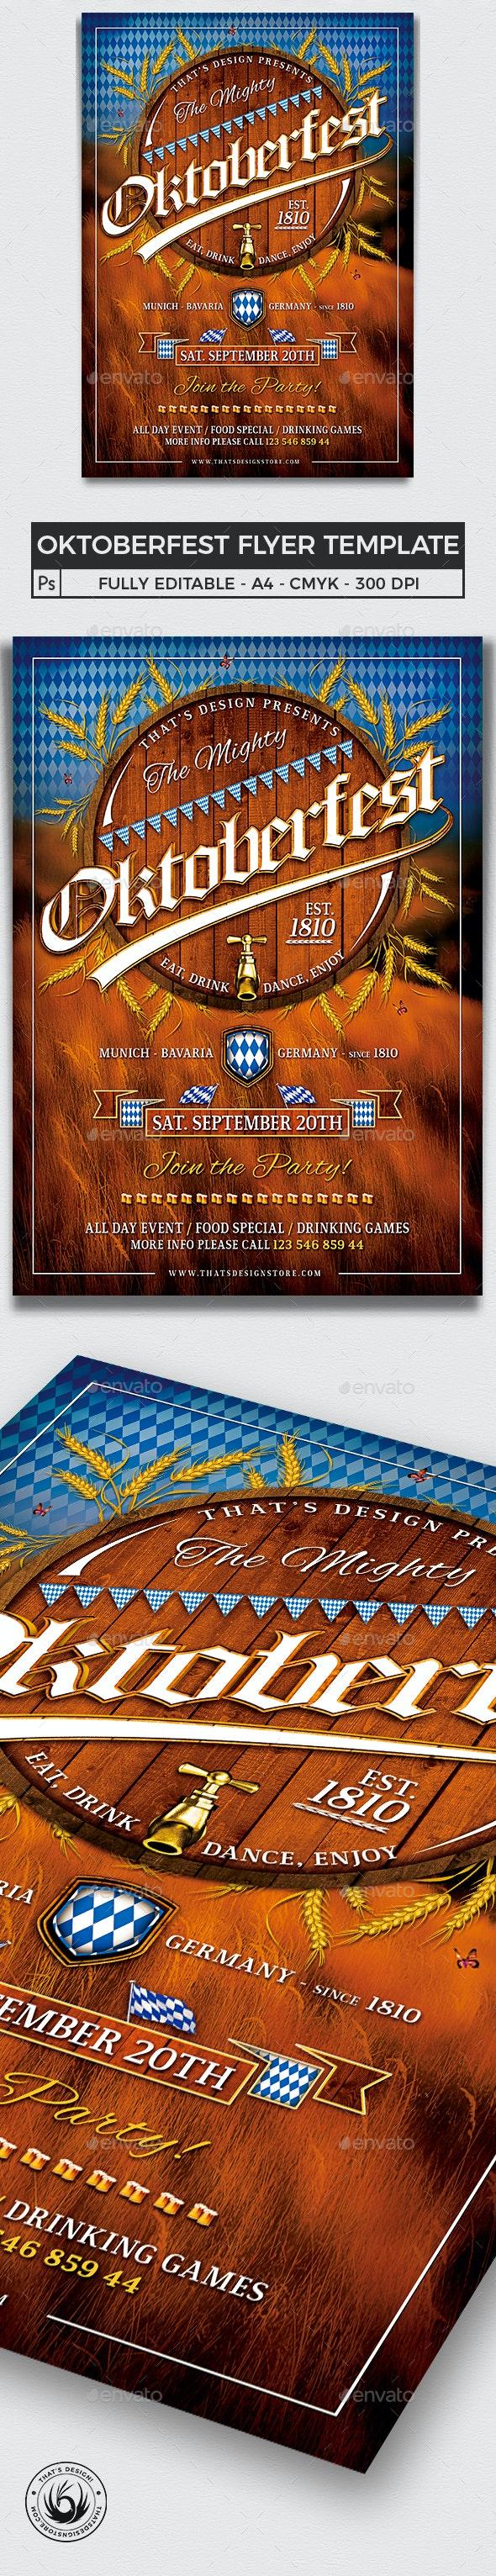 Oktoberfest Flyer Template V2 - Holidays Events